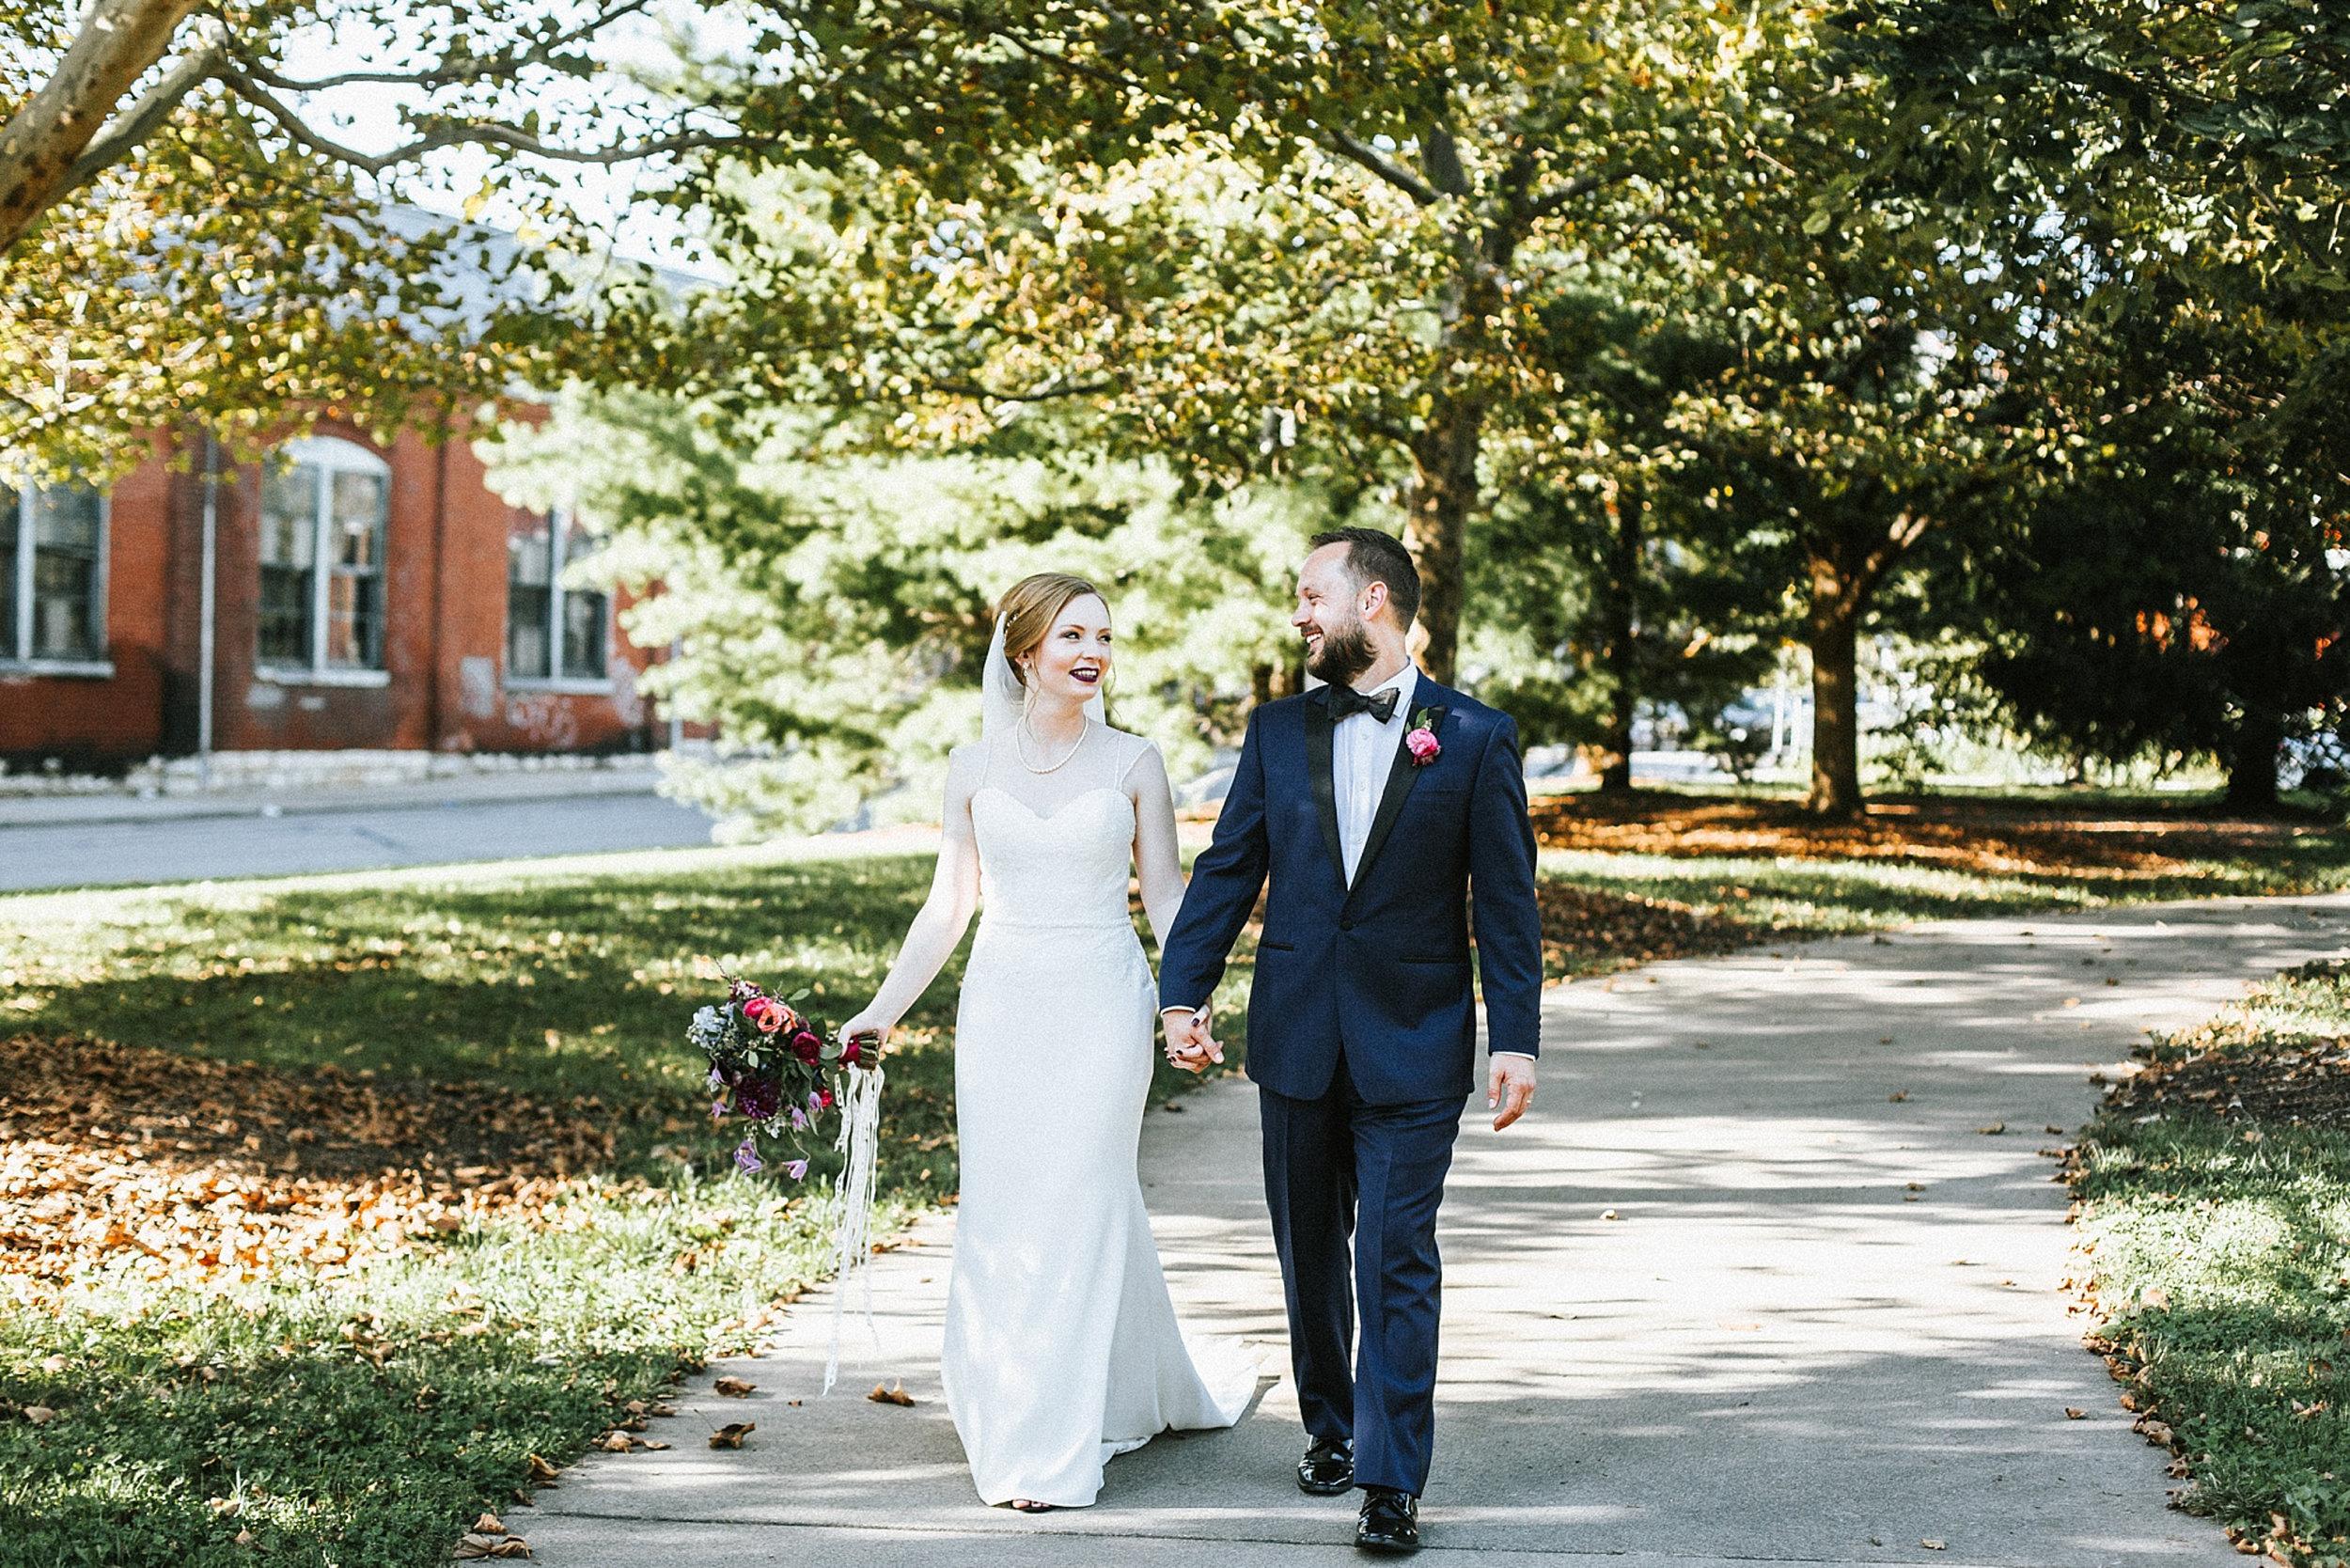 Brooke Townsend Photography - Ohio Wedding Photographer-149.jpg